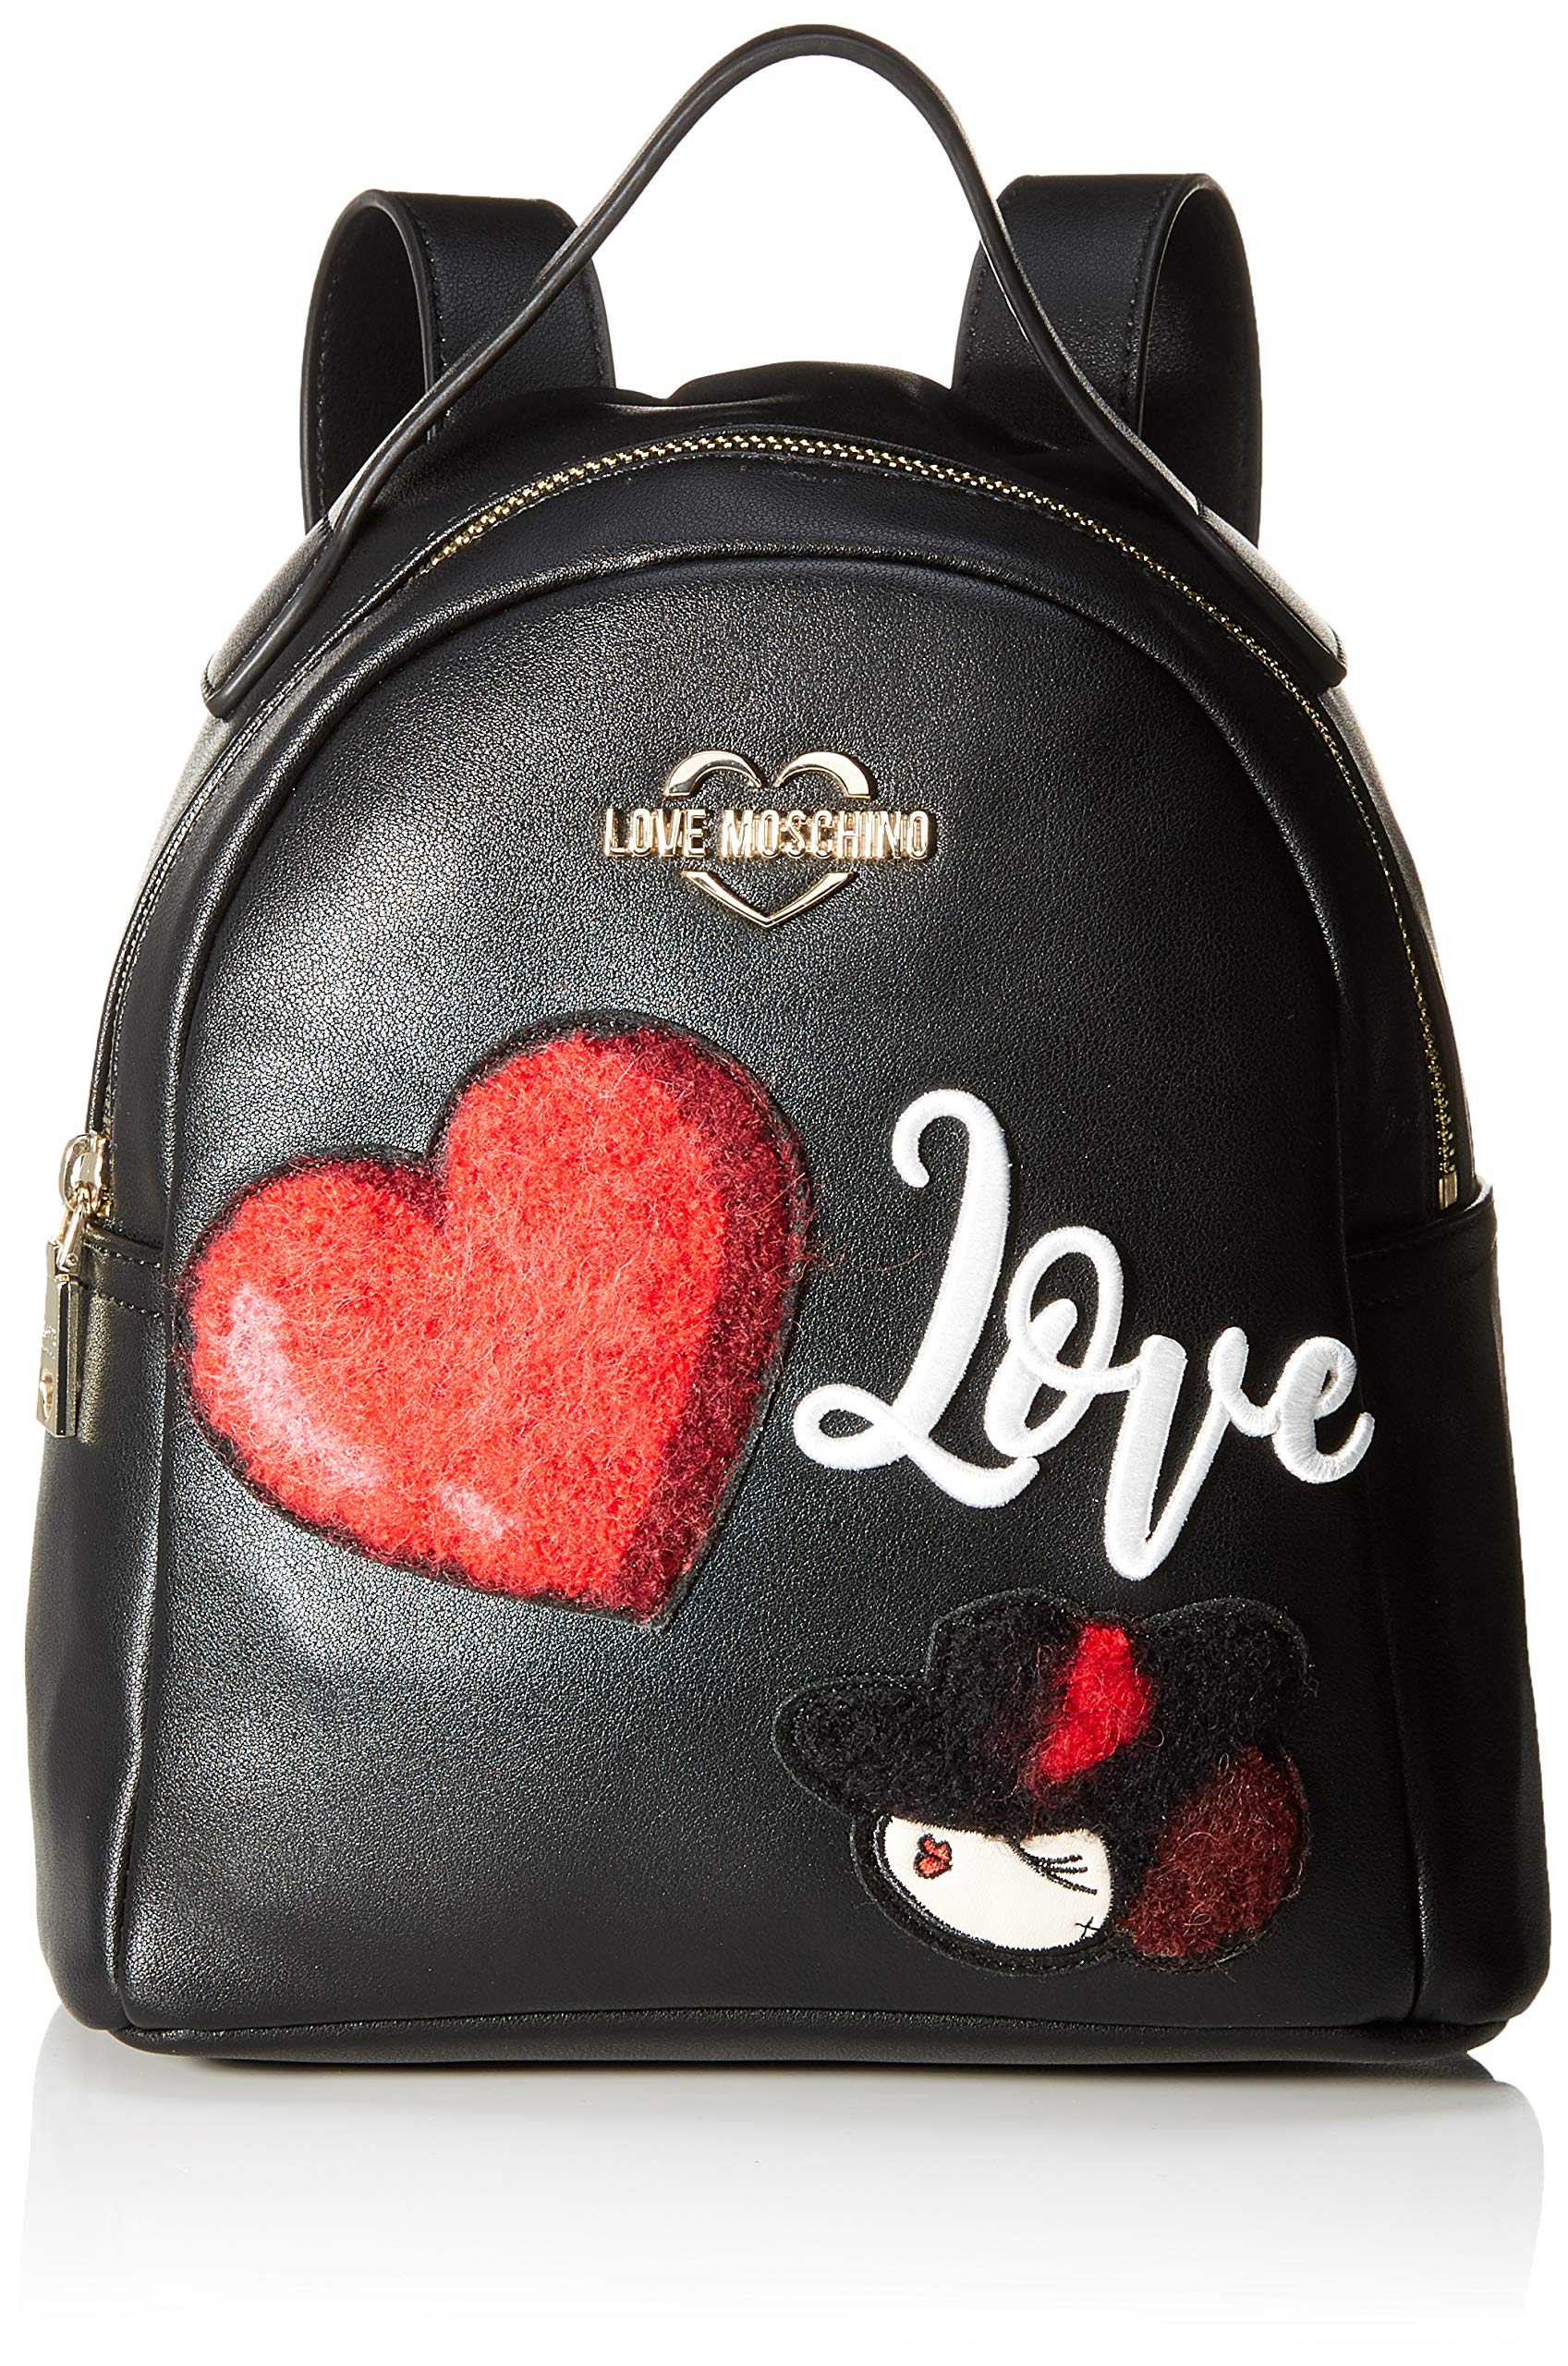 Love Cmw H Jc4091pp18lp0000Mixte L Moschino X AdulteNoirnero27x9x24 4jL35ASqcR